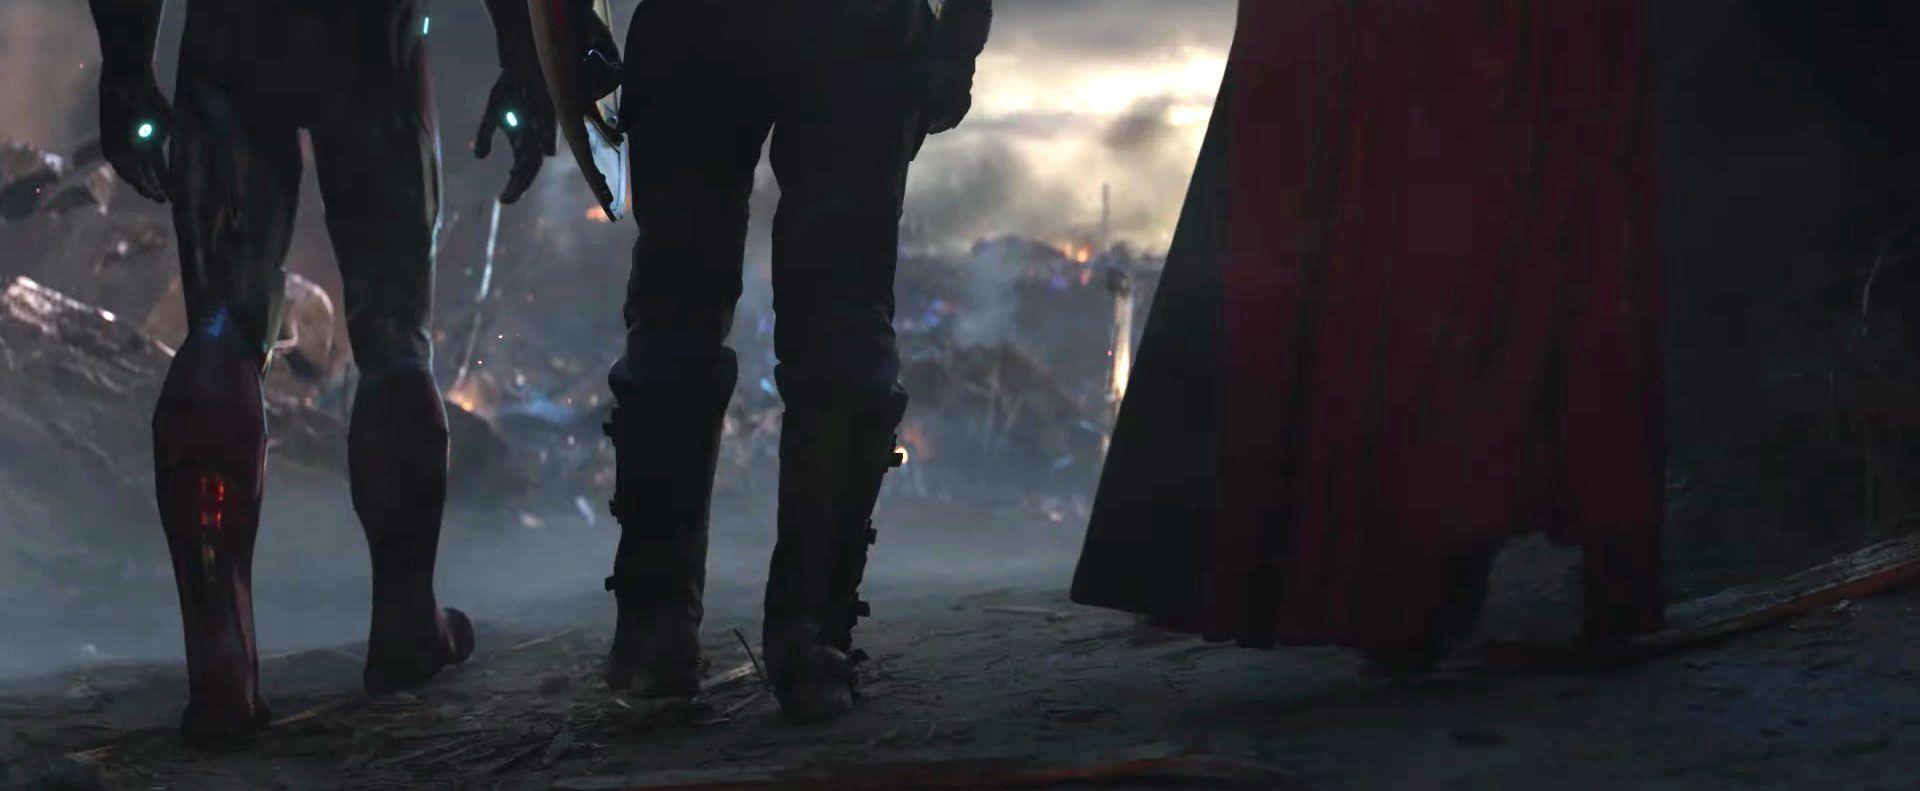 Avengers Endgame, Capitan America, Iron Man, Thor